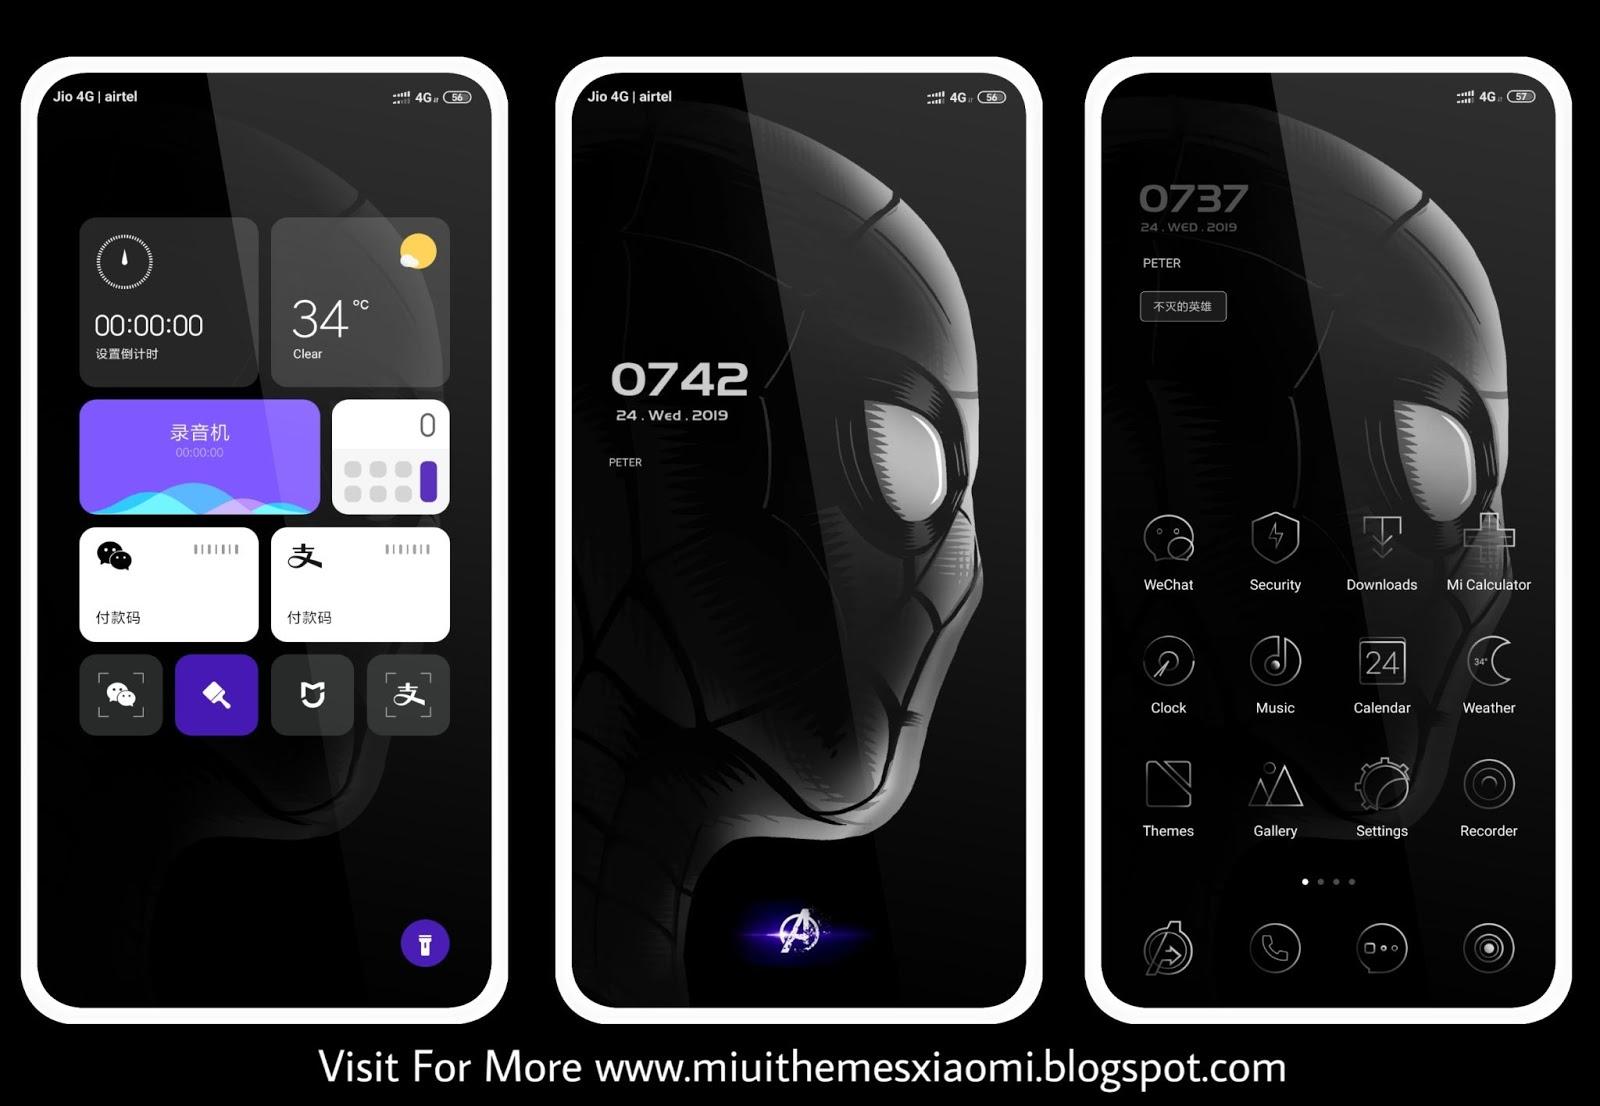 Avengers: Endgame Edition MIUI Theme Download For Xiaomi